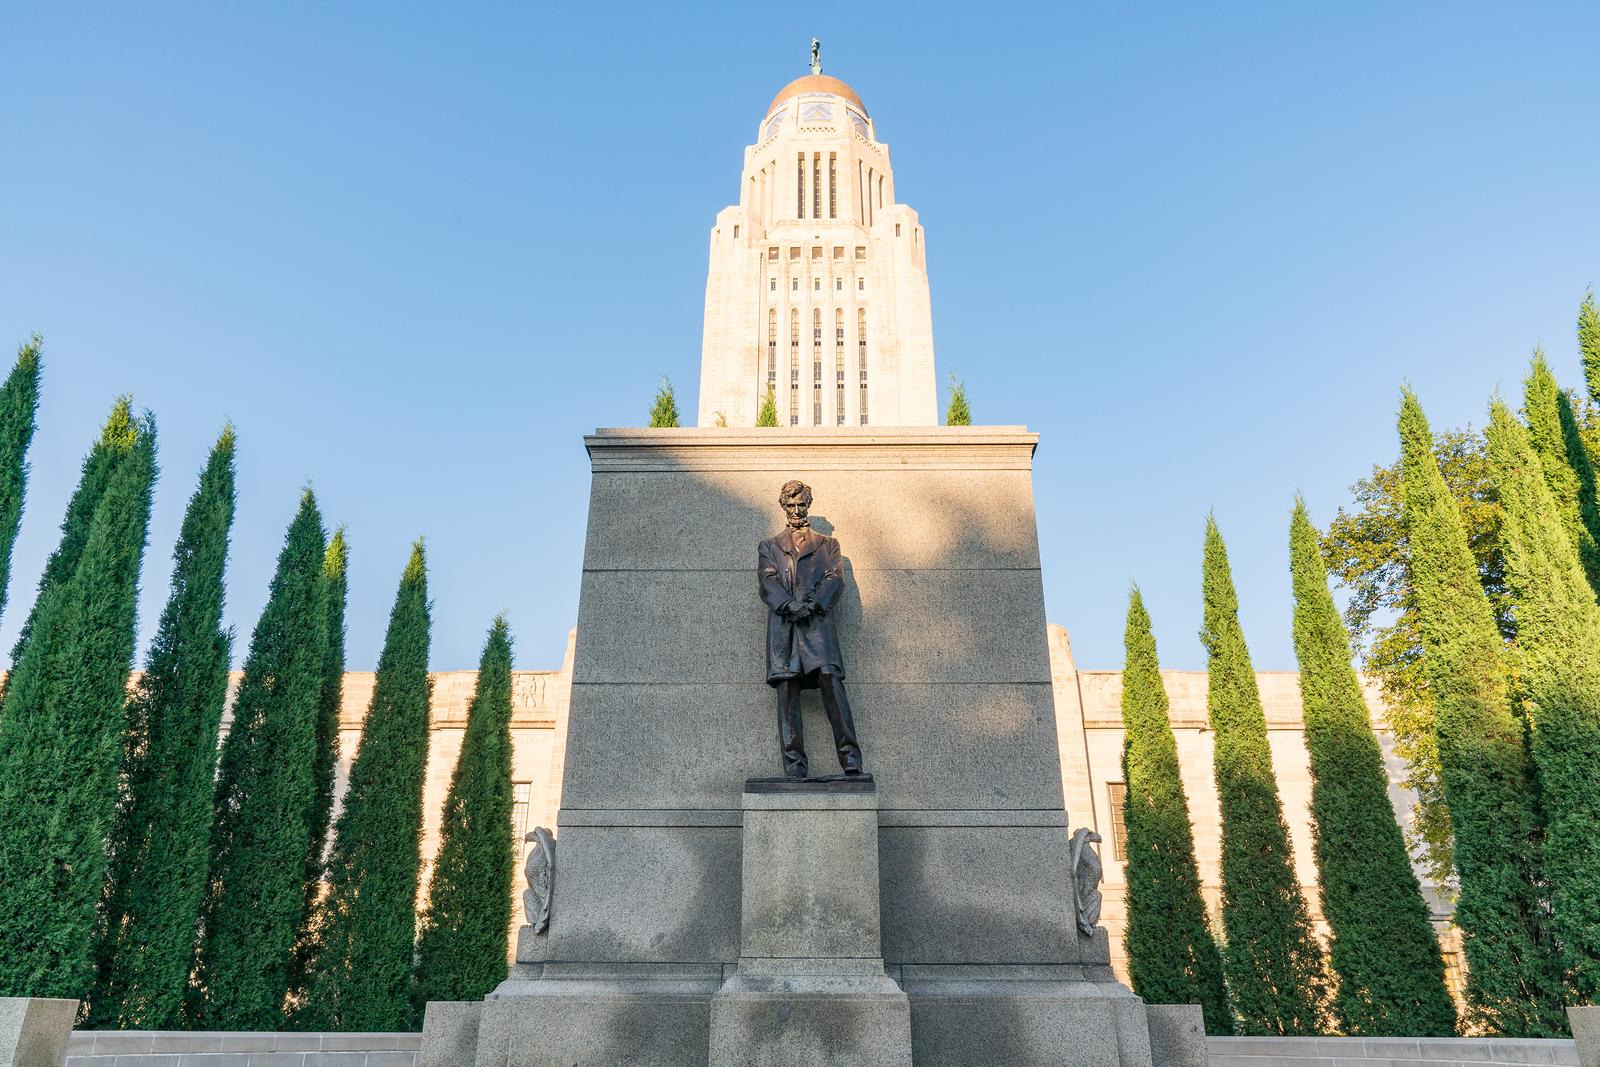 Statue of Abraham Lincoln at Nebraska State Capitol